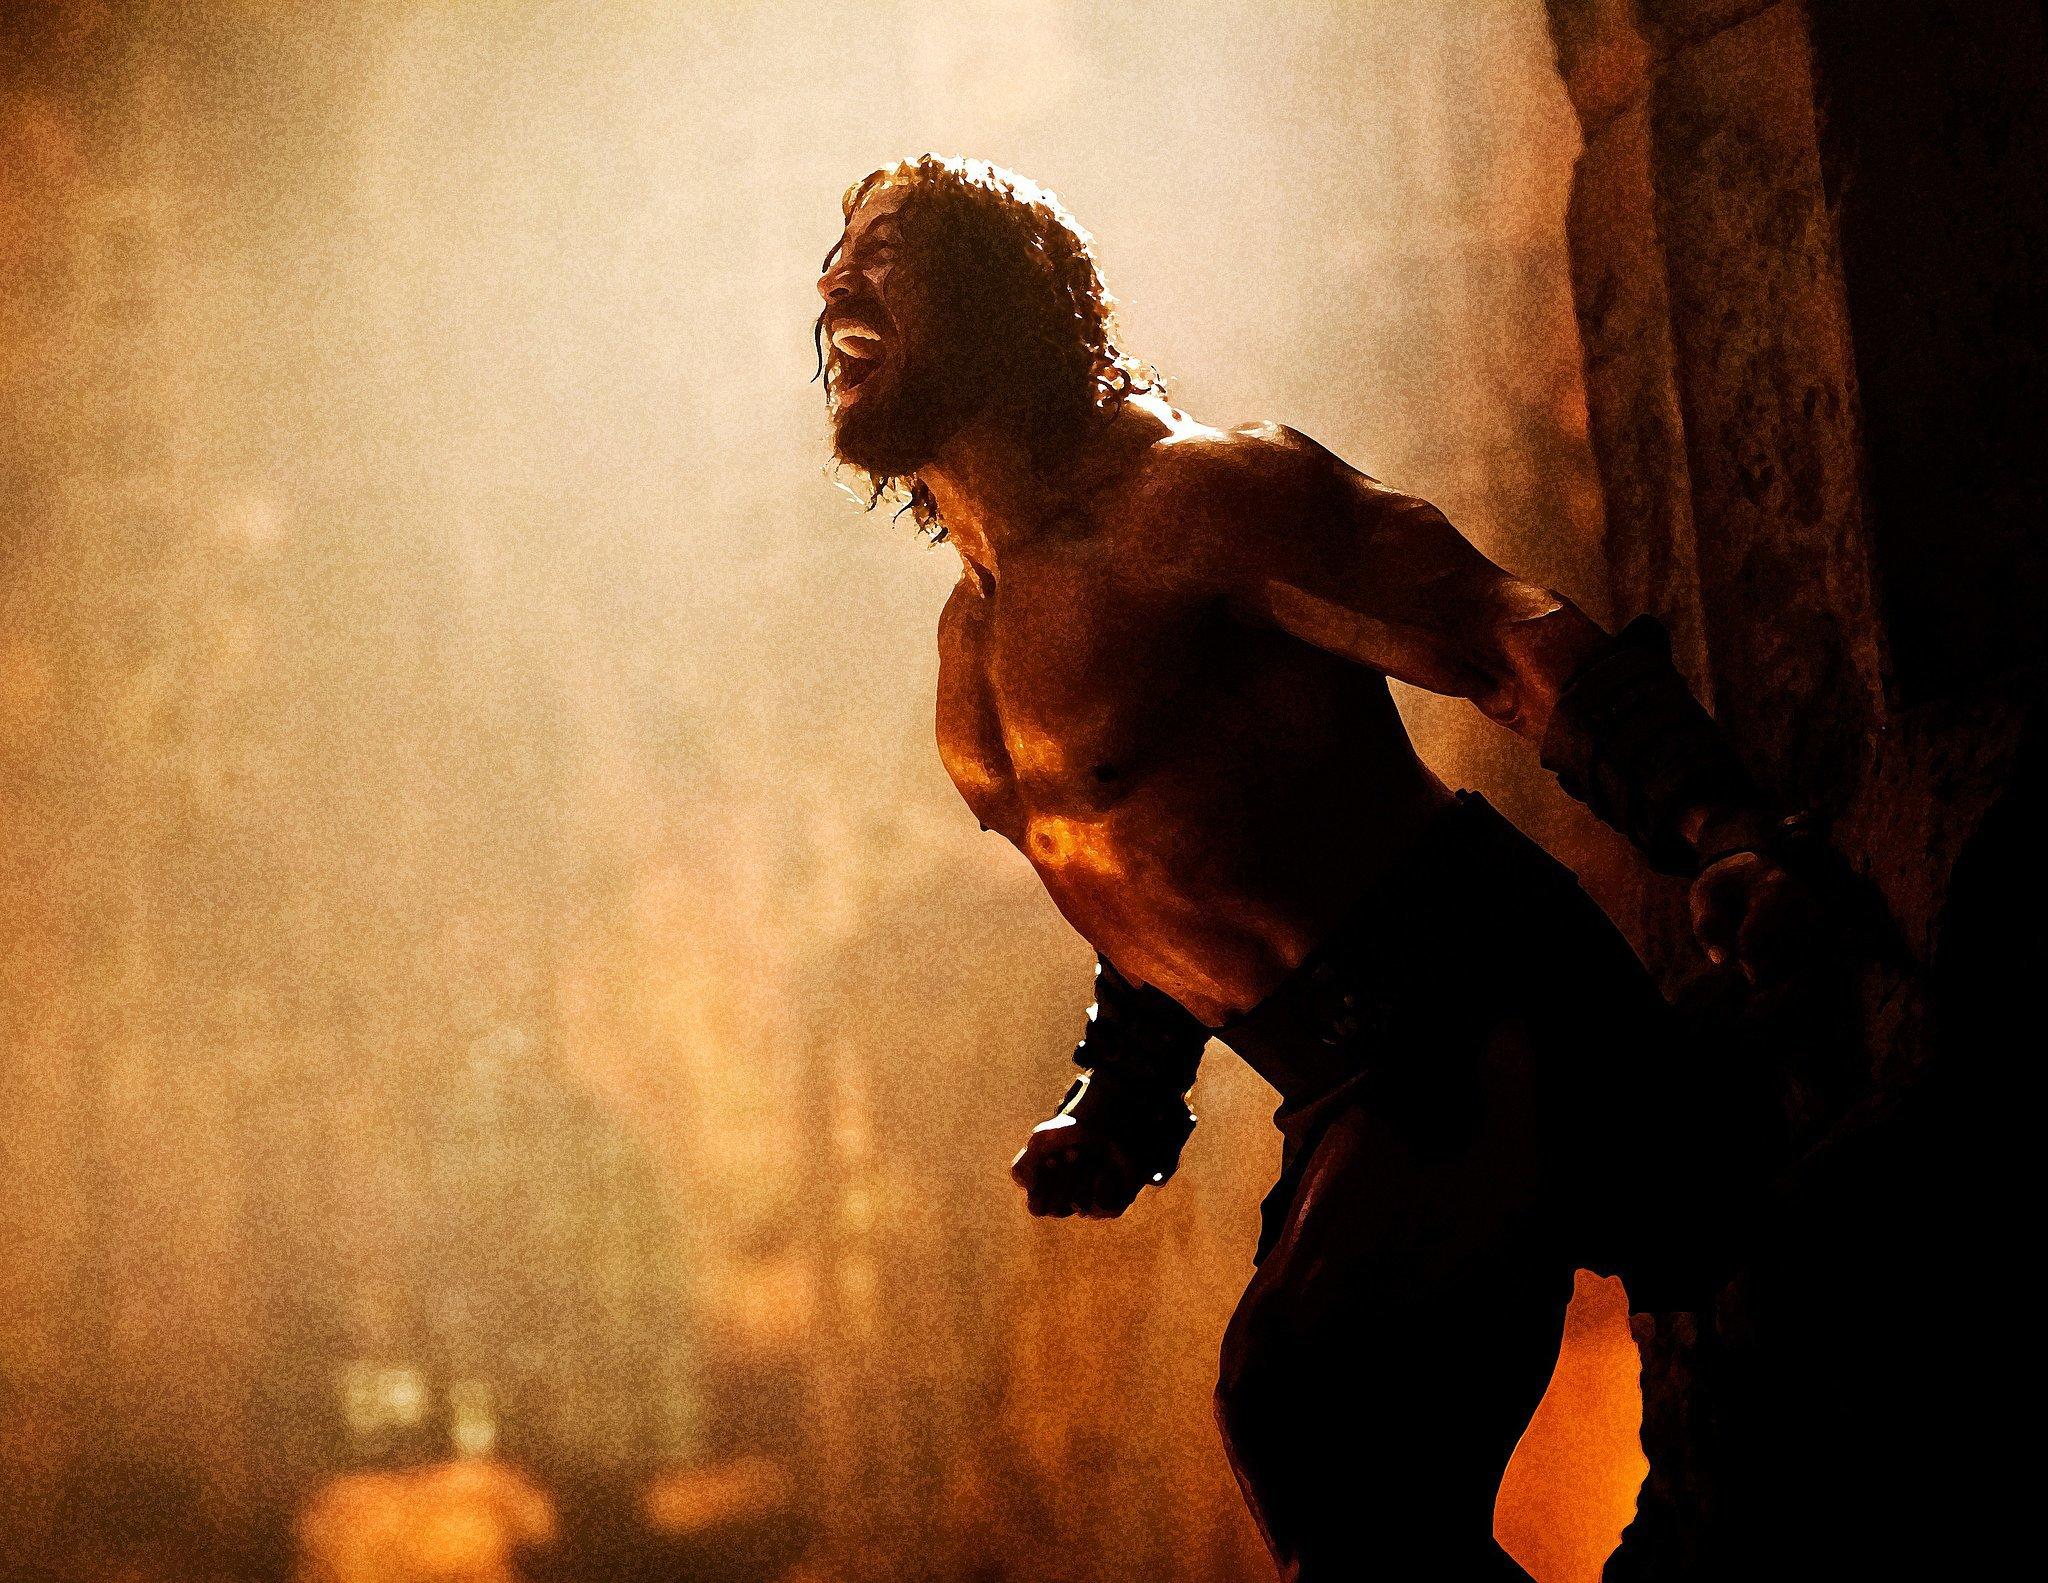 Dwayne Johnson in Hercules